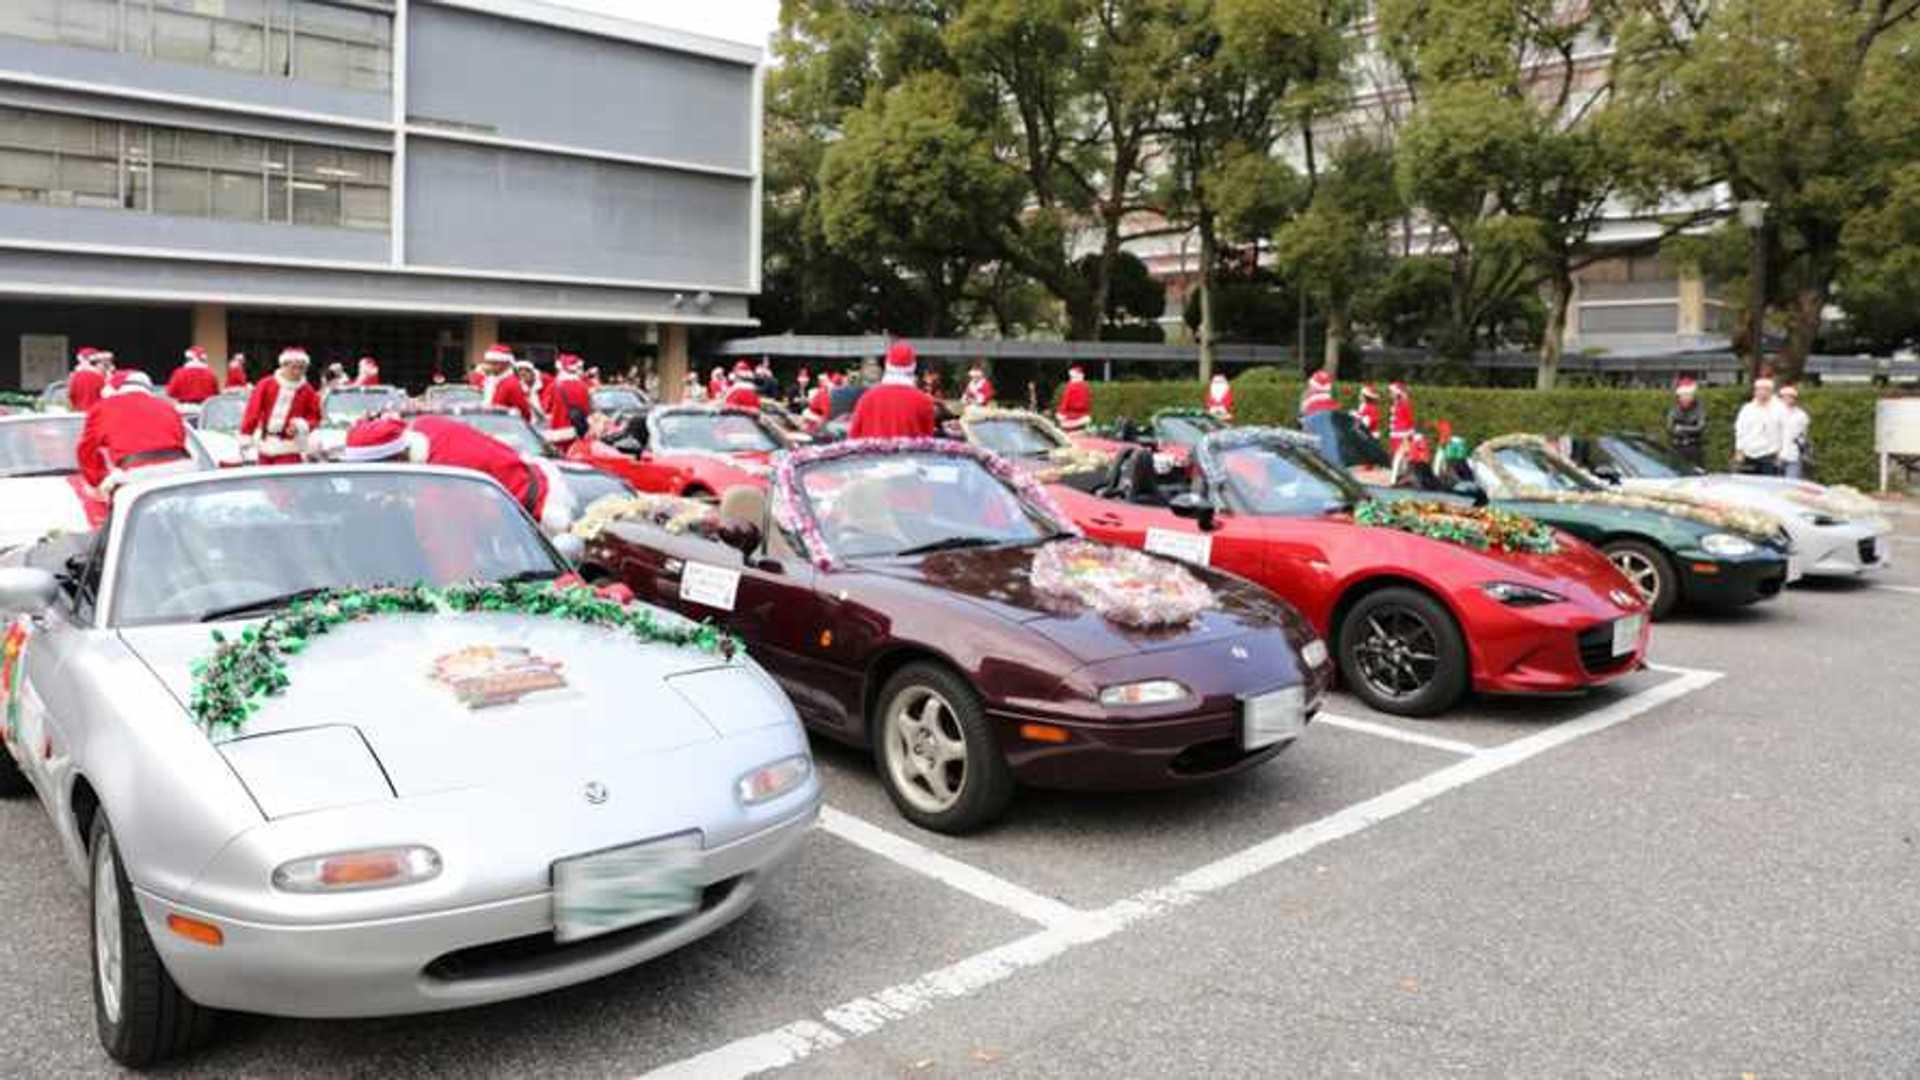 Santa Swaps Sleigh For Miata To Spread Joy In Japan